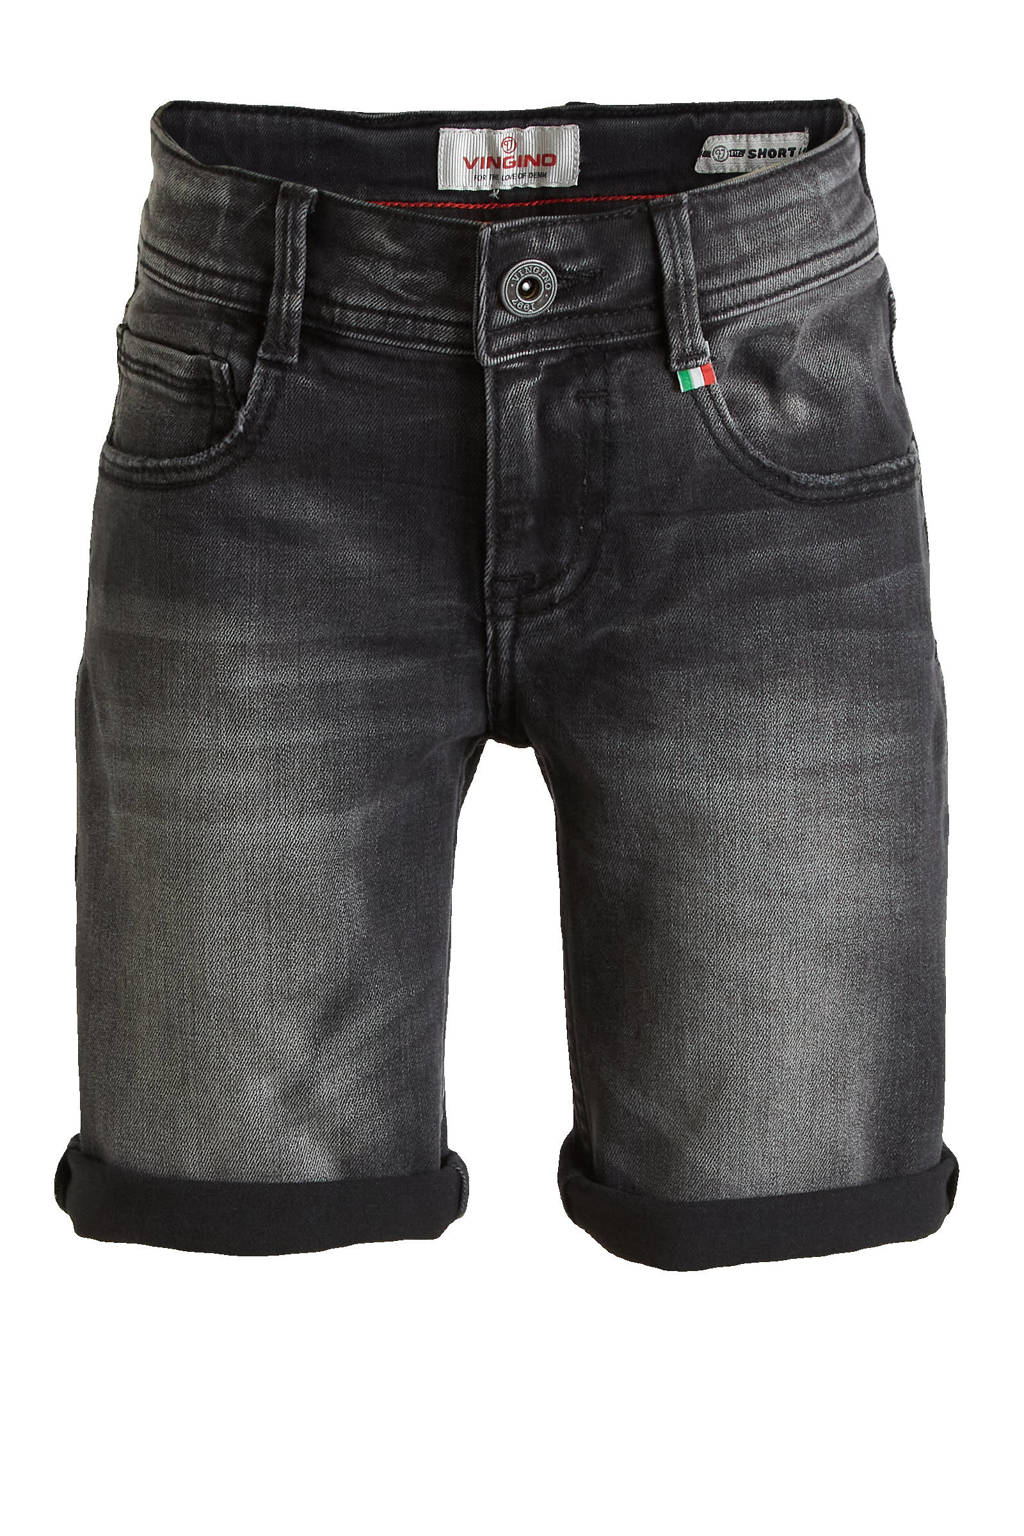 Vingino jeans bermuda Claas black, Black